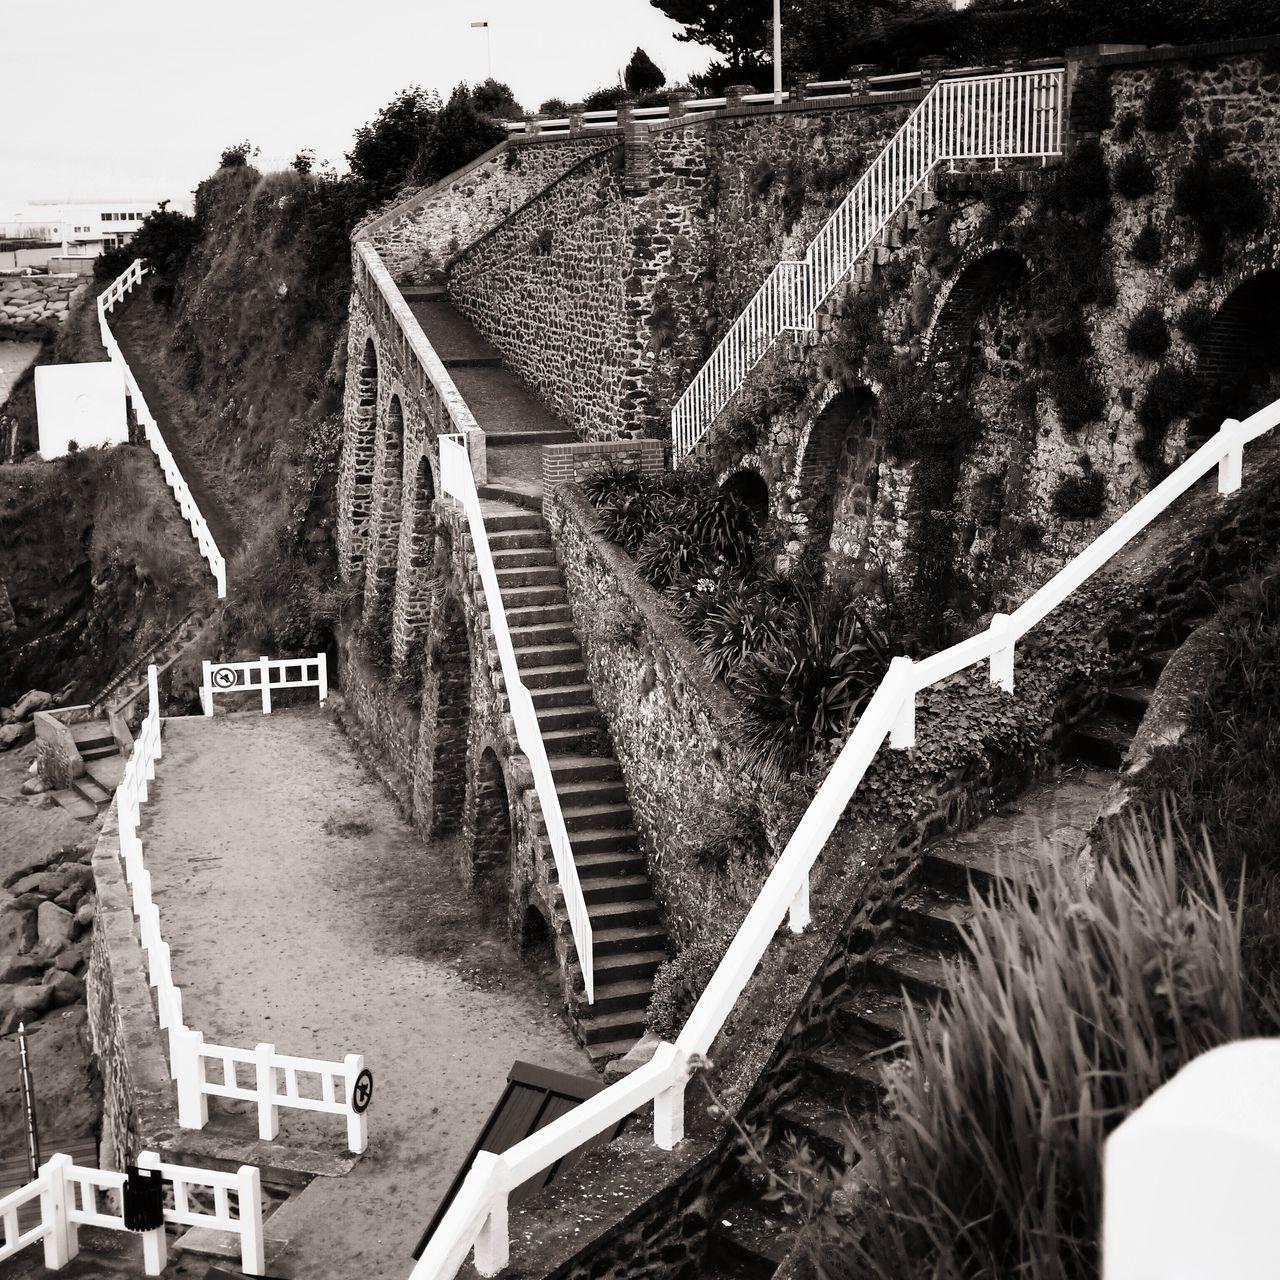 Staircases On Mountain